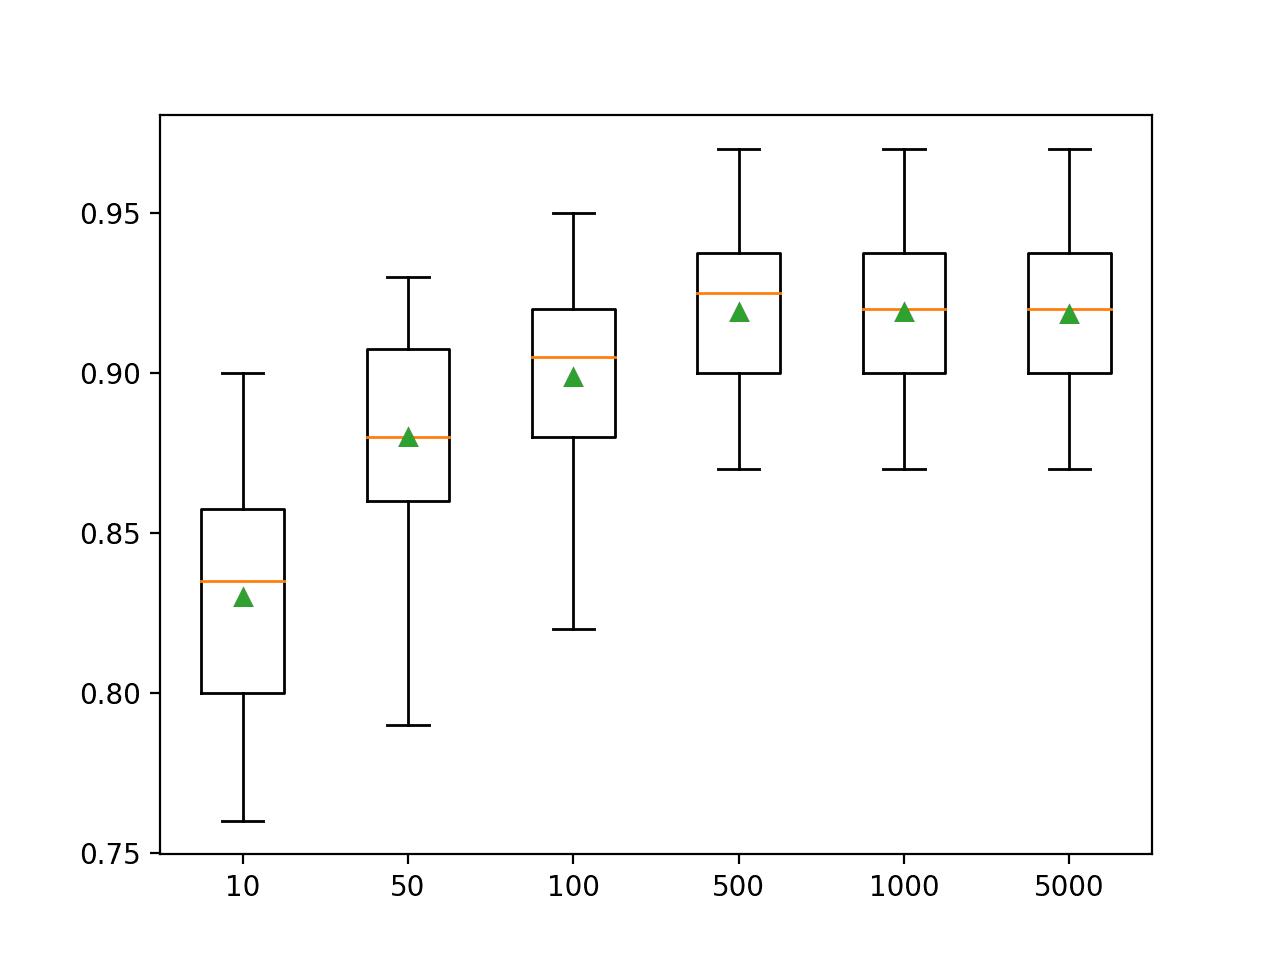 Box Plot of Gradient Boosting Ensemble Size vs. Classification Accuracy